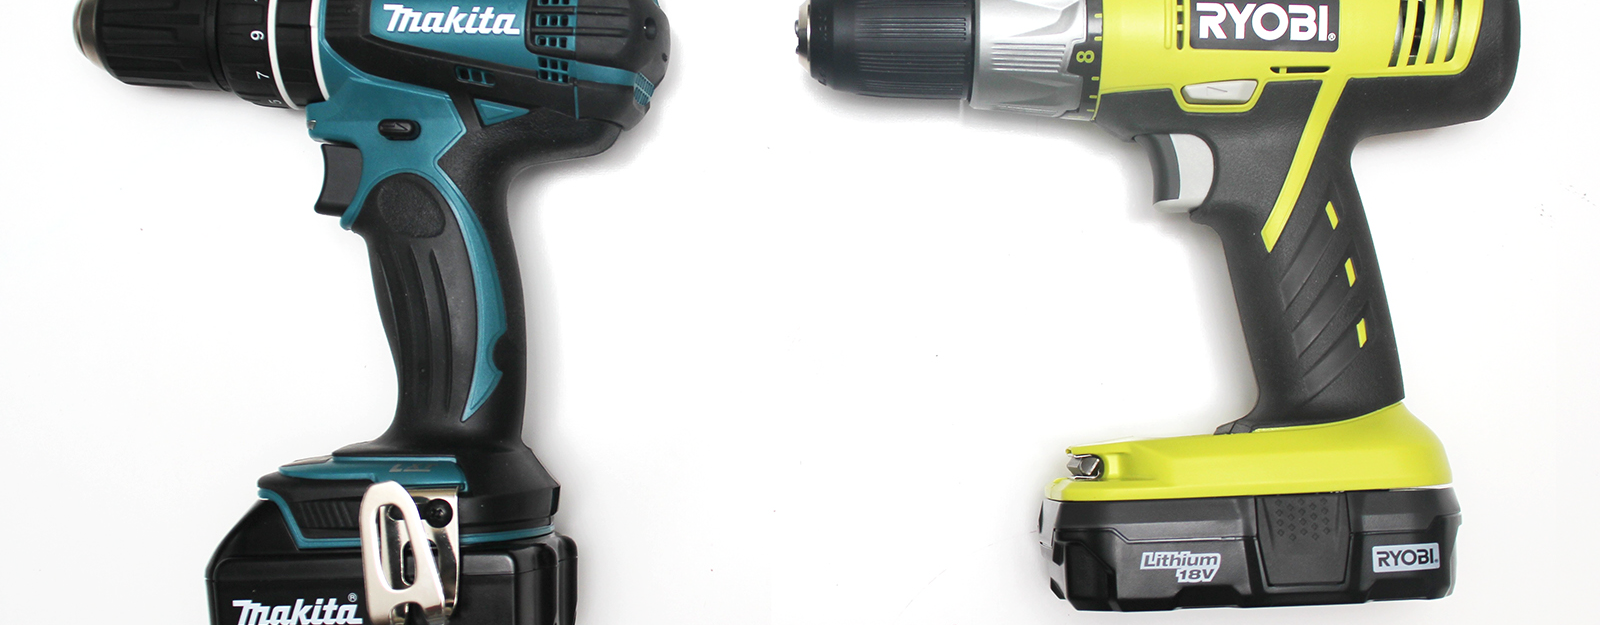 Drafting Table Quarterback: Power Drill Teardown - Core77